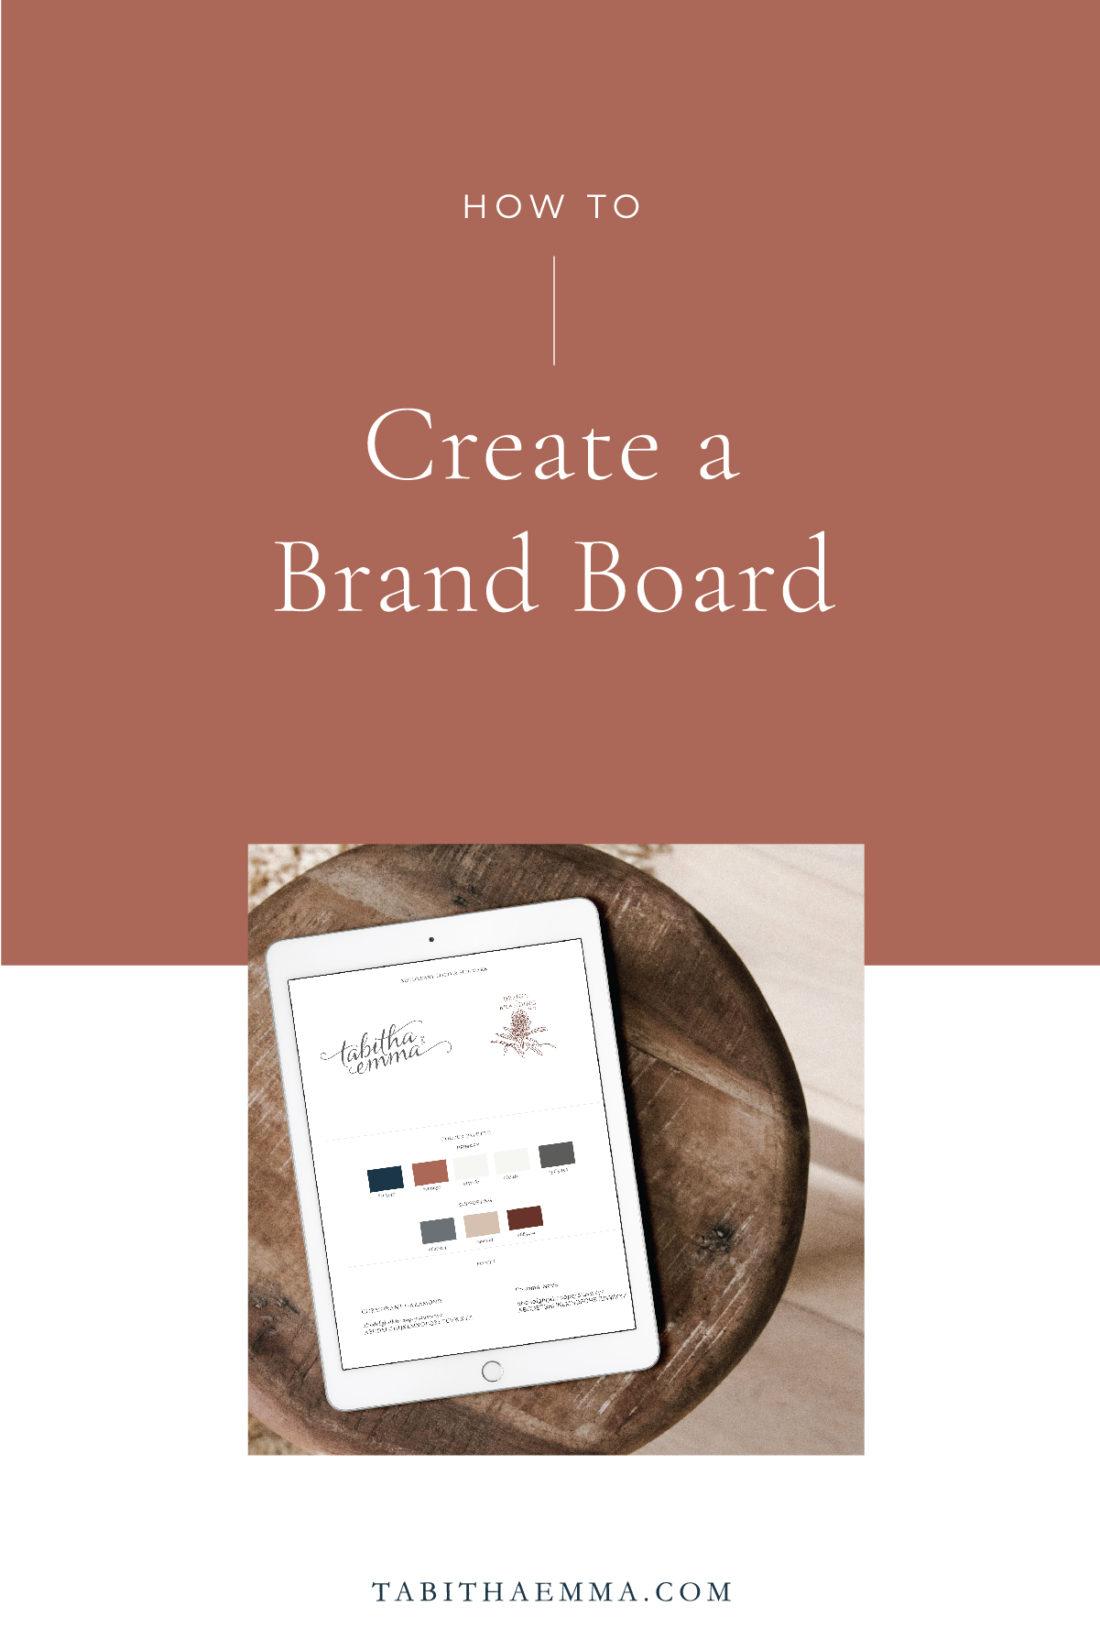 Create a Brand Board